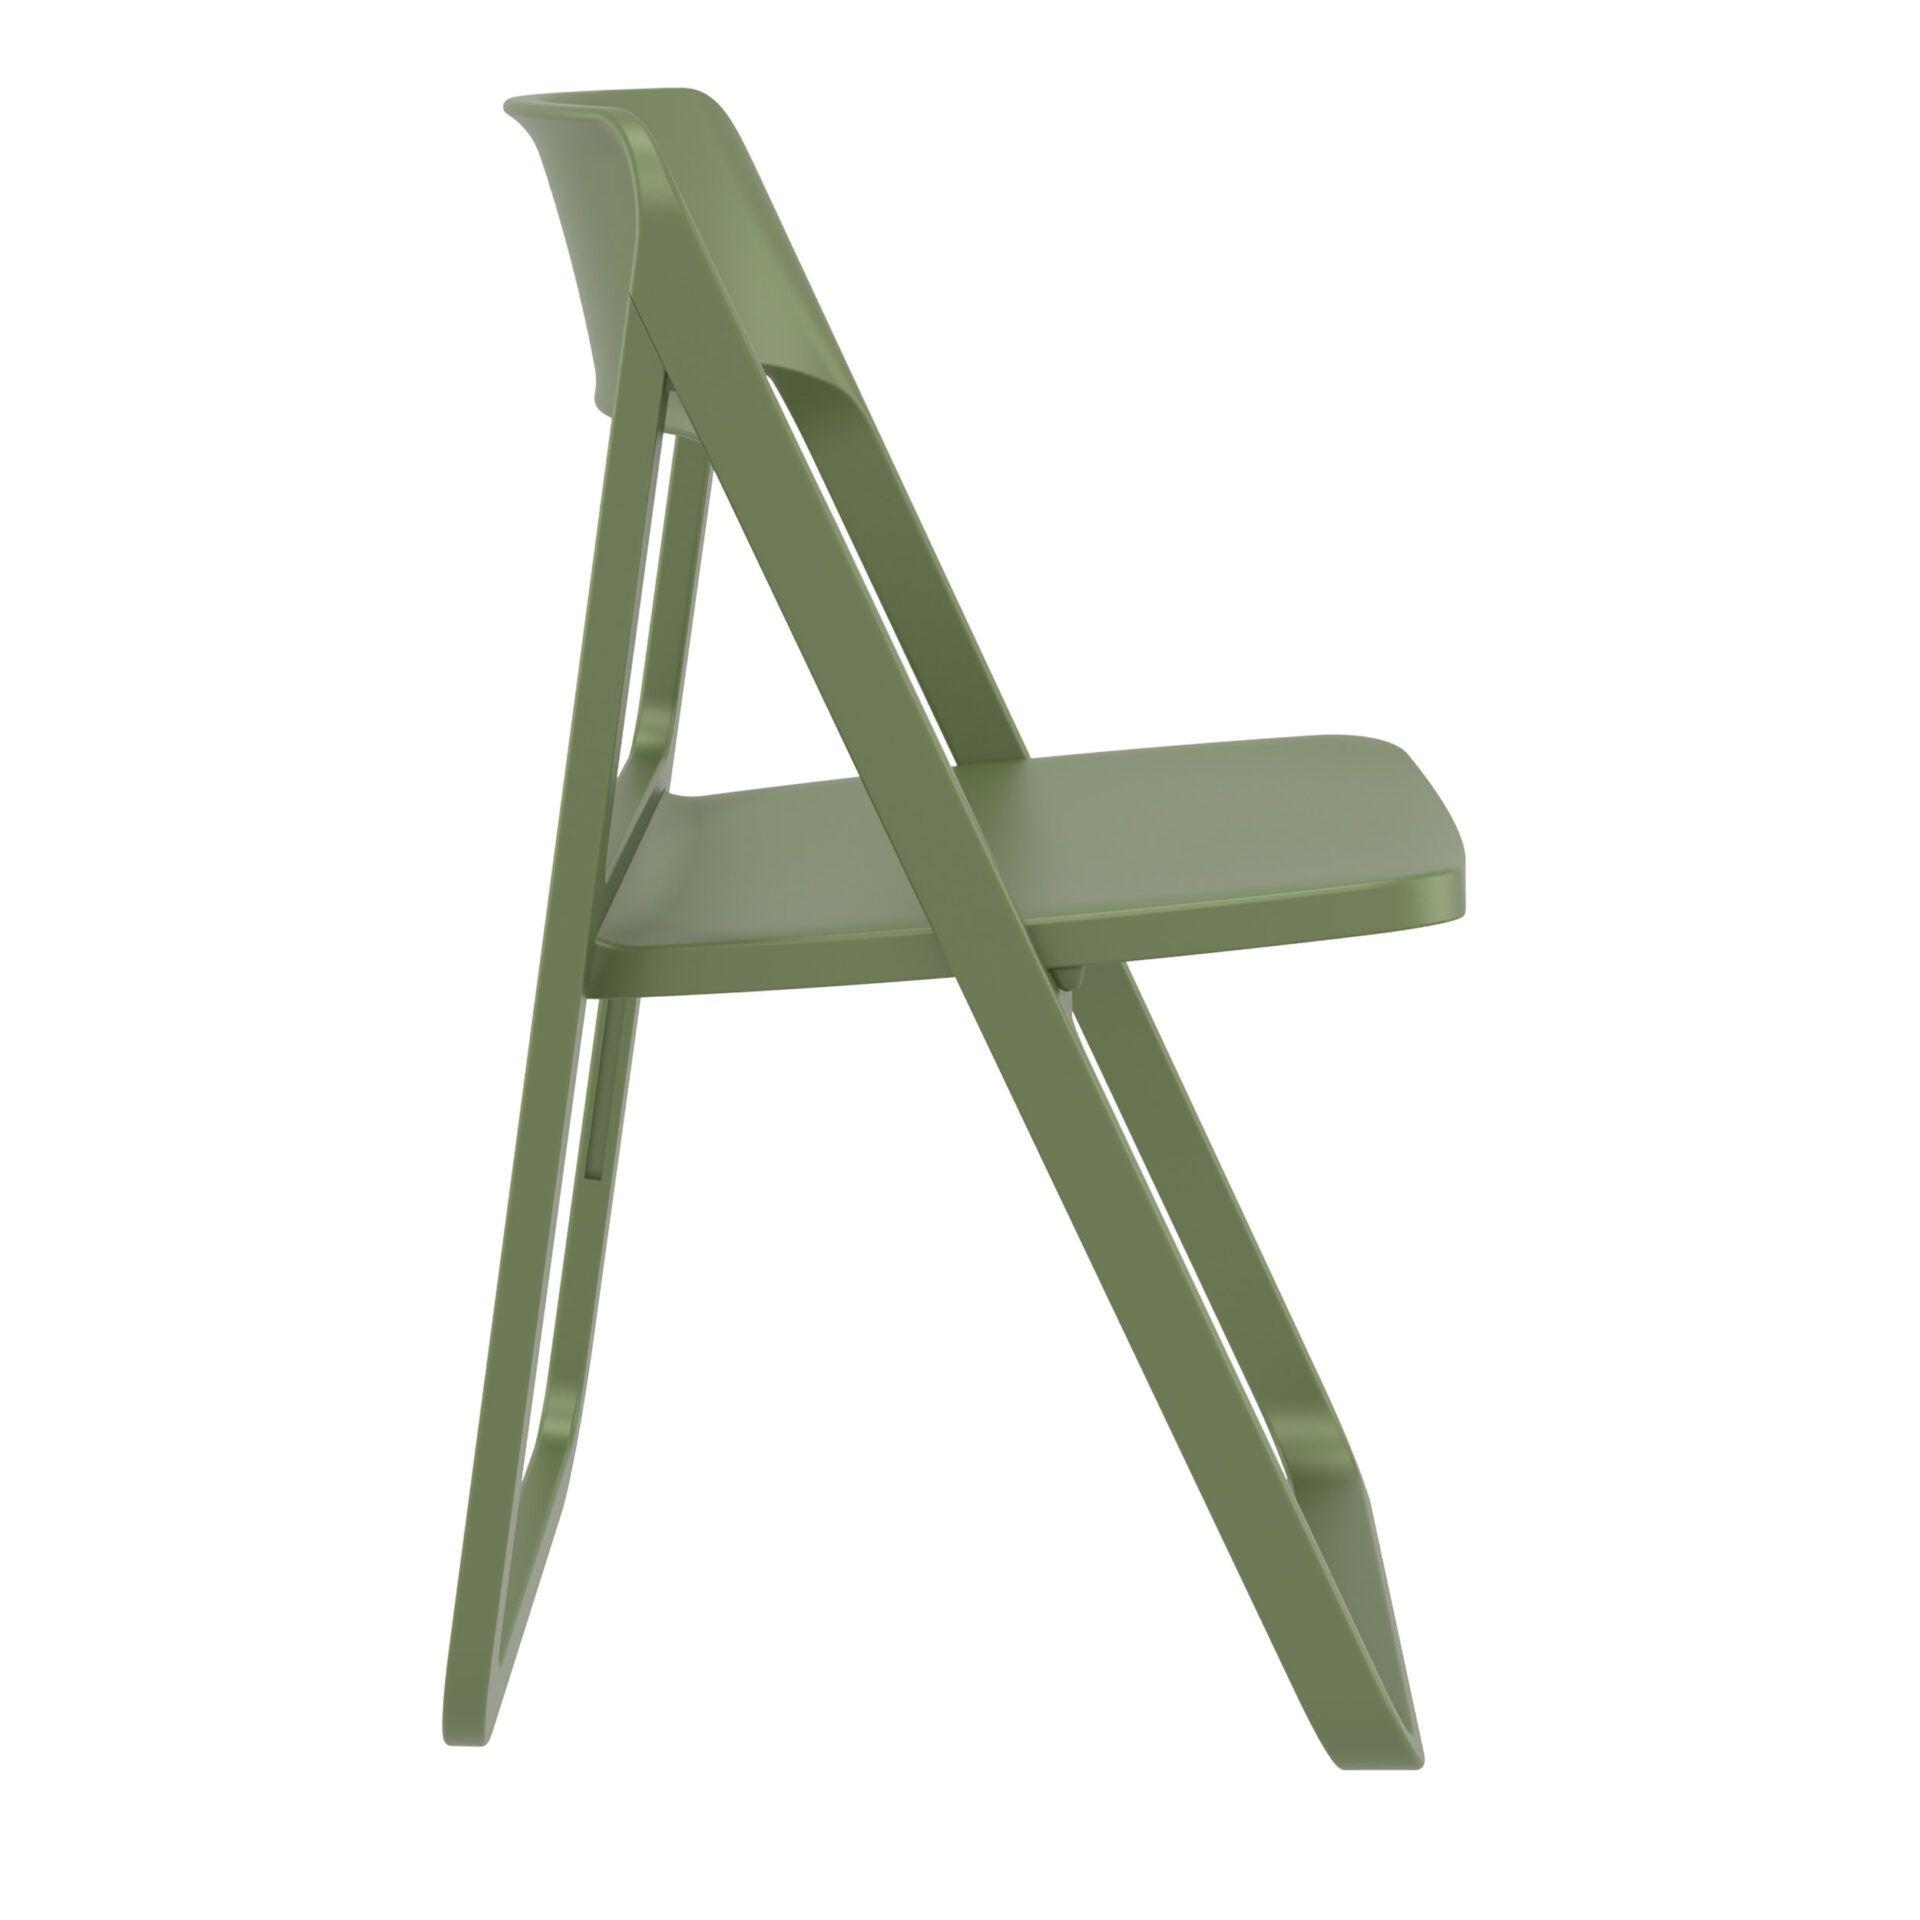 polypropylene dream folding chair olive green side